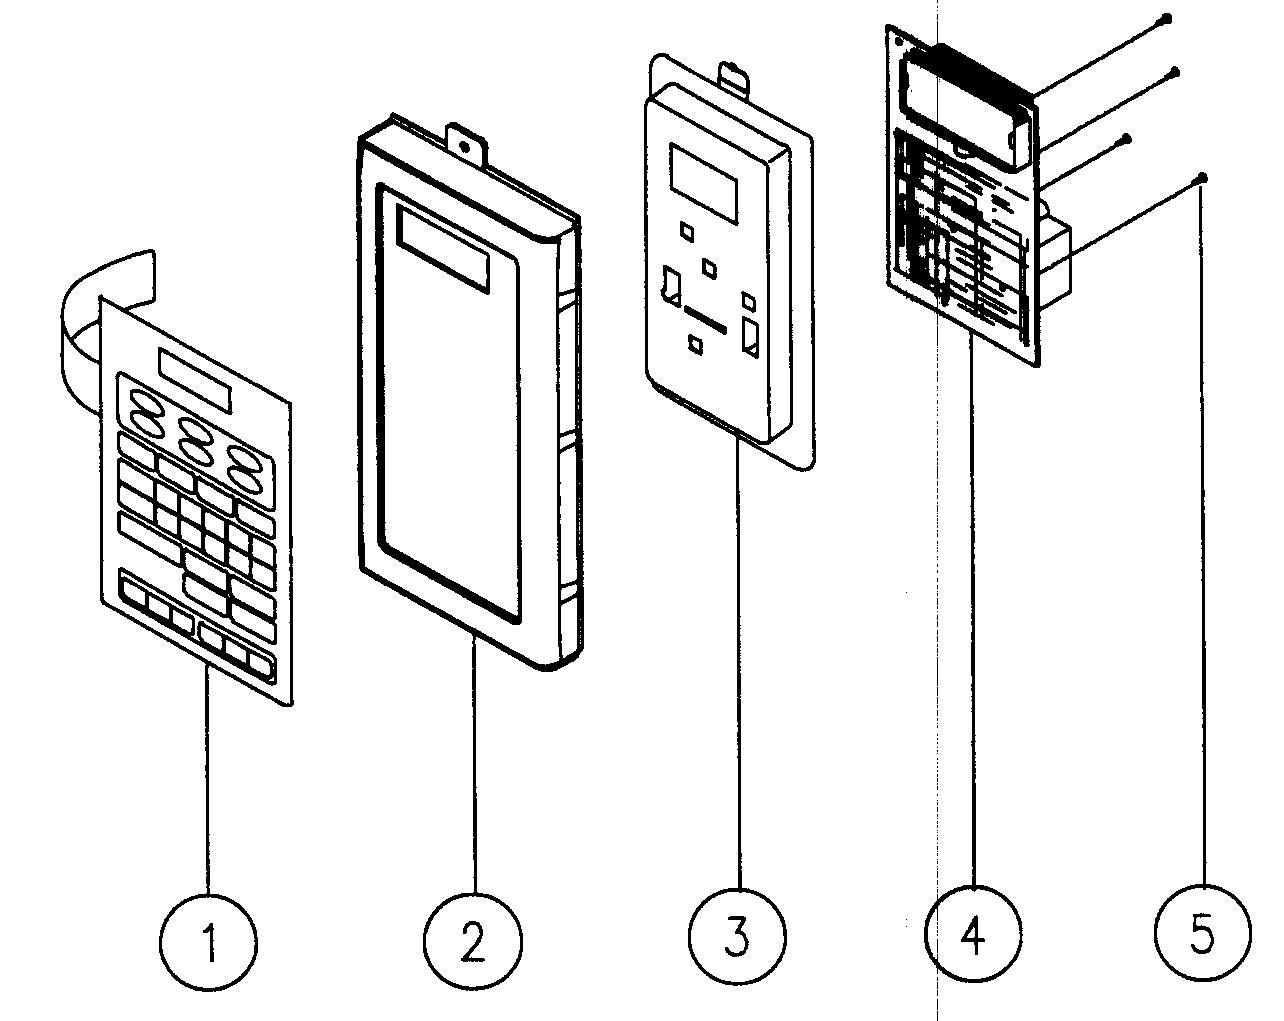 hight resolution of magic chef mco160uw control panel diagram